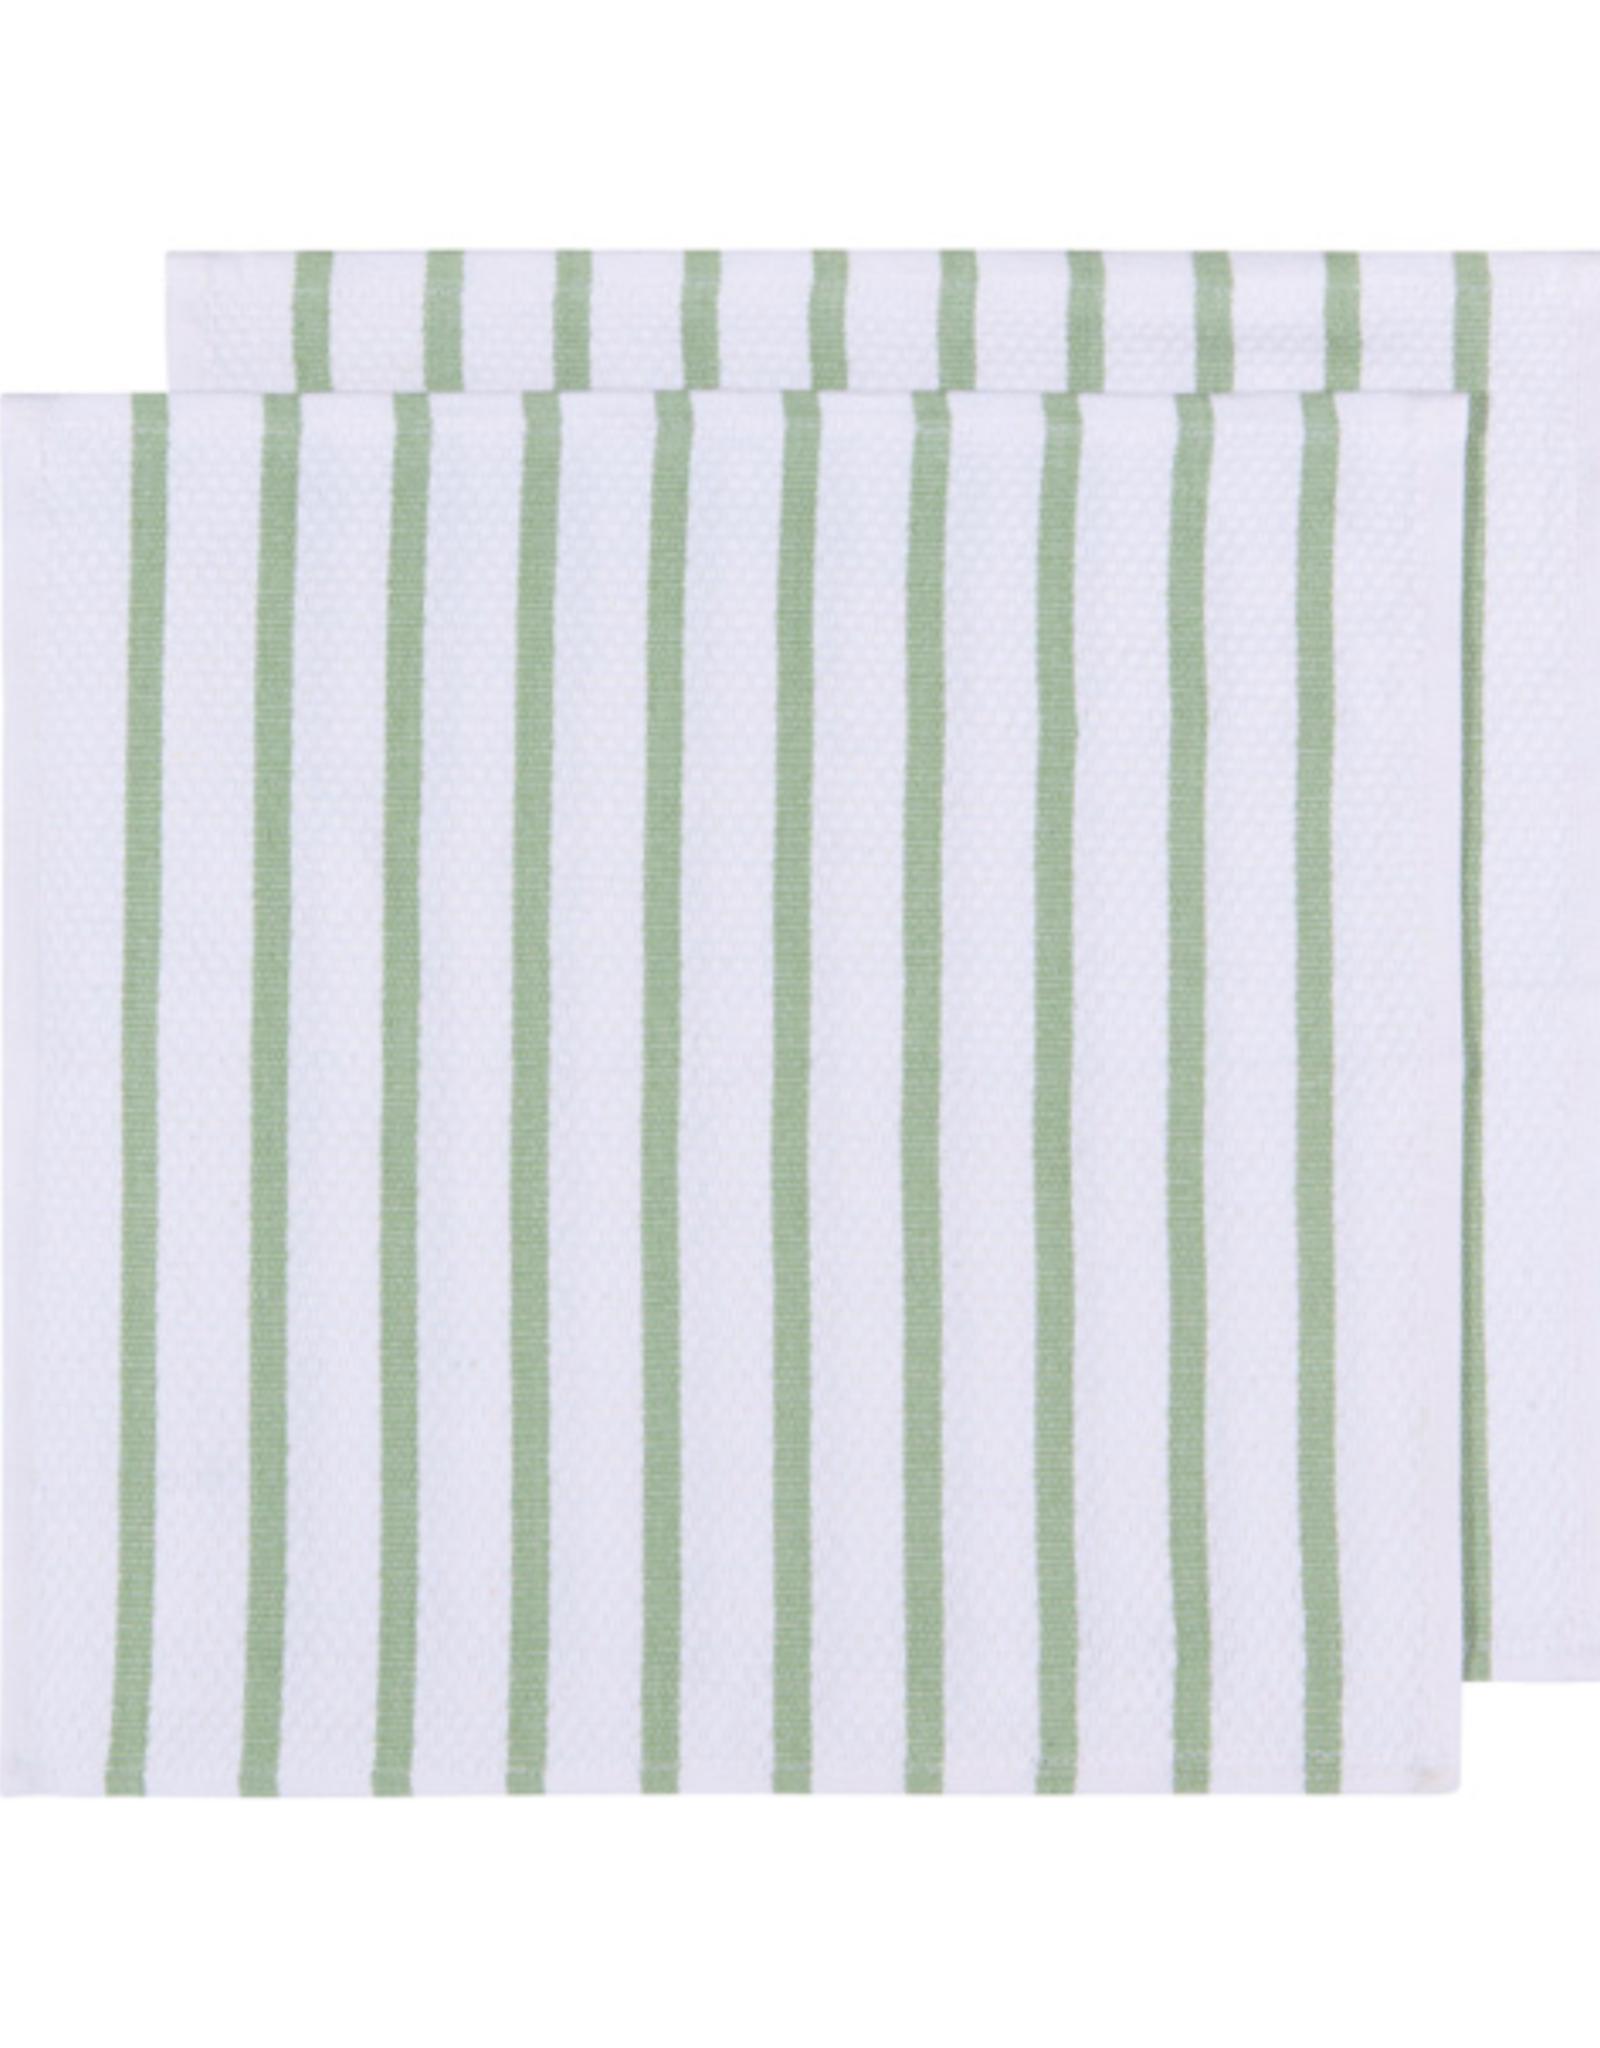 DCA - Dish Cloth / Set 2, Basketweave, Moss